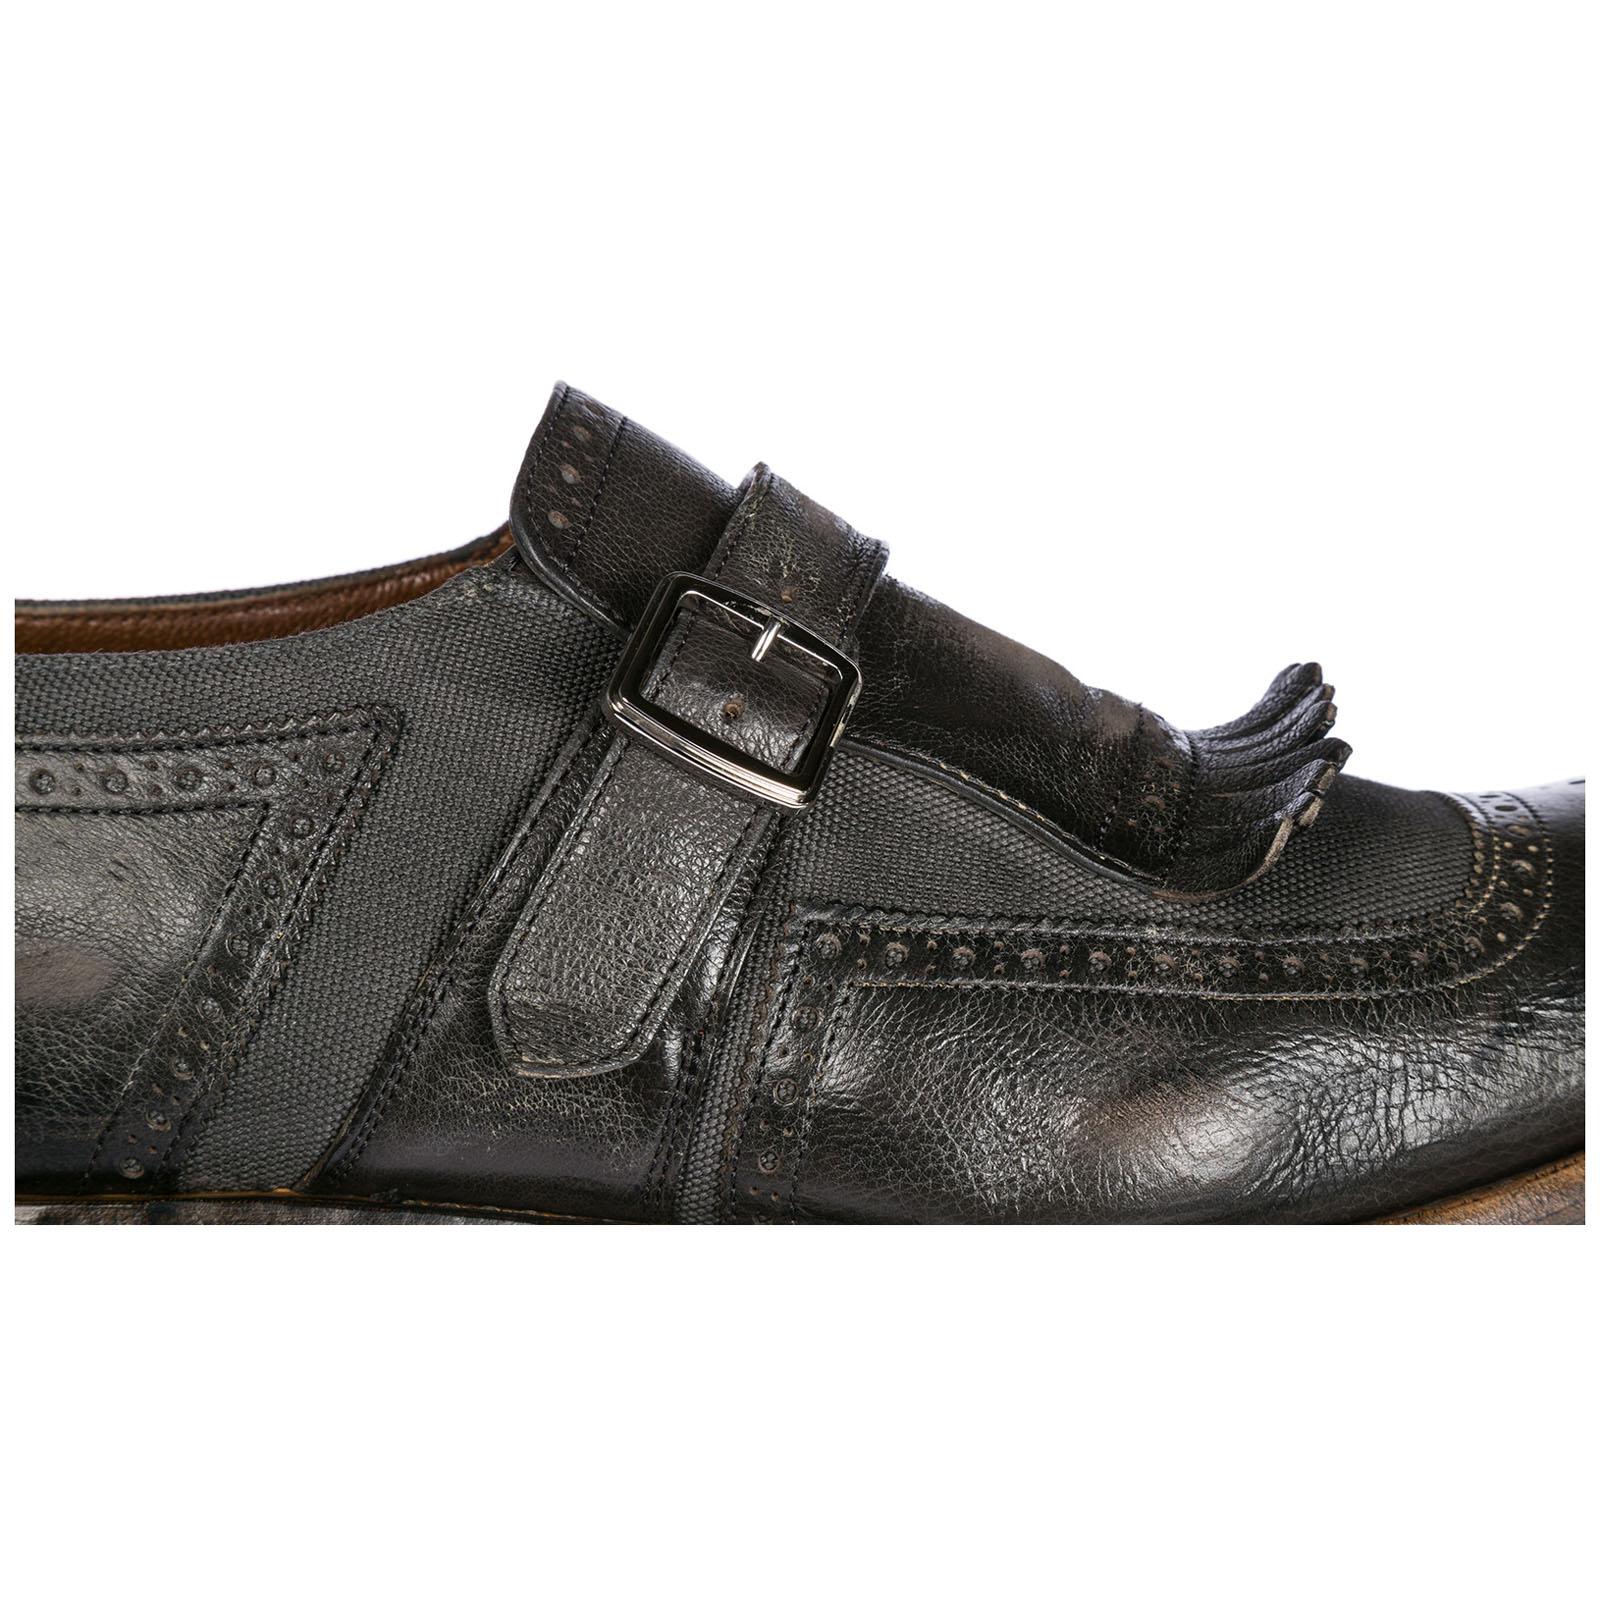 da97b8fff18 ... Men s classic leather formal shoes slip on monkstrap